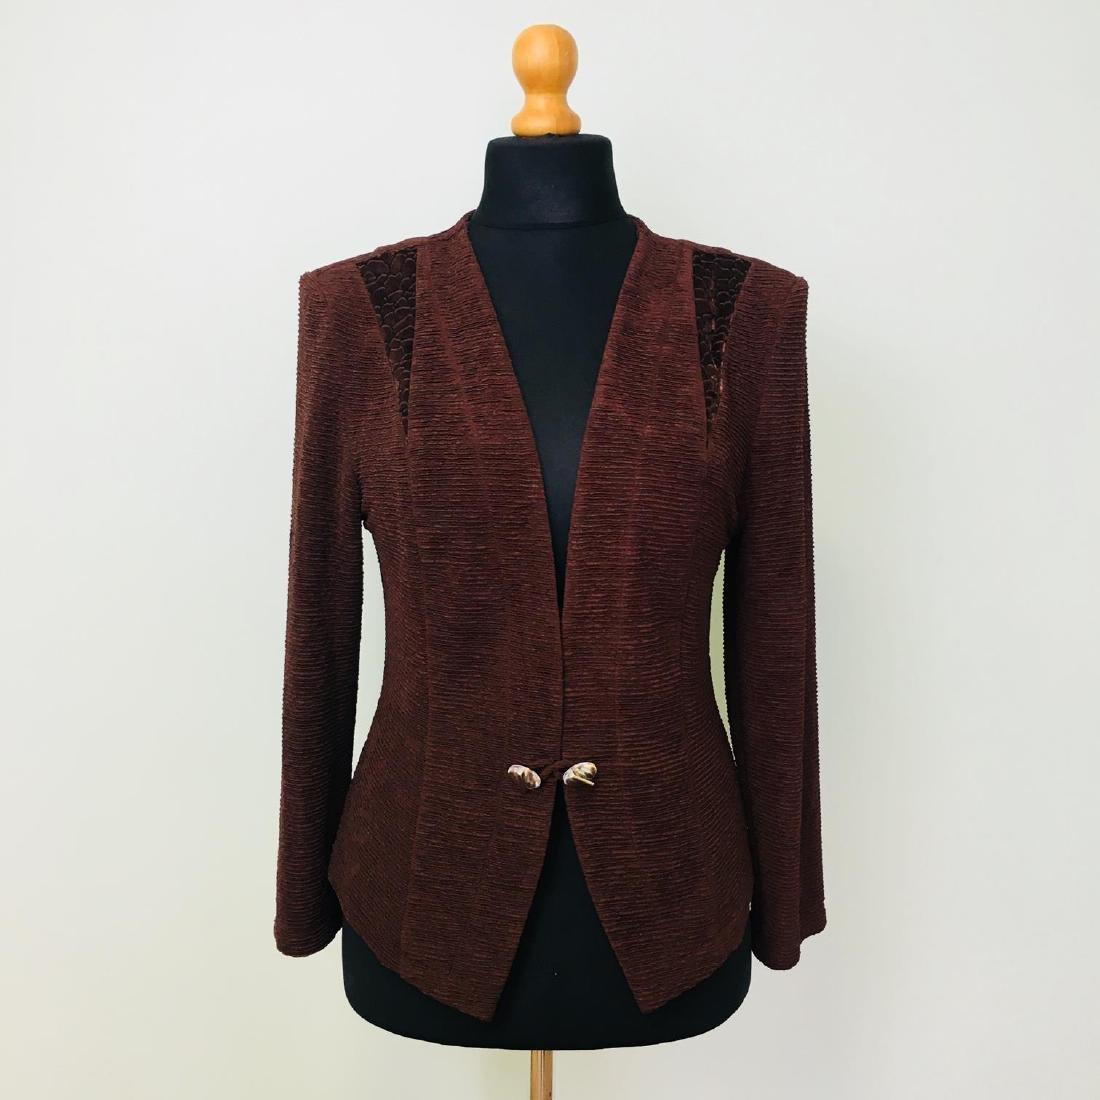 Vintage Women's 2 Piece Evening Jacket Dress Size M - 8